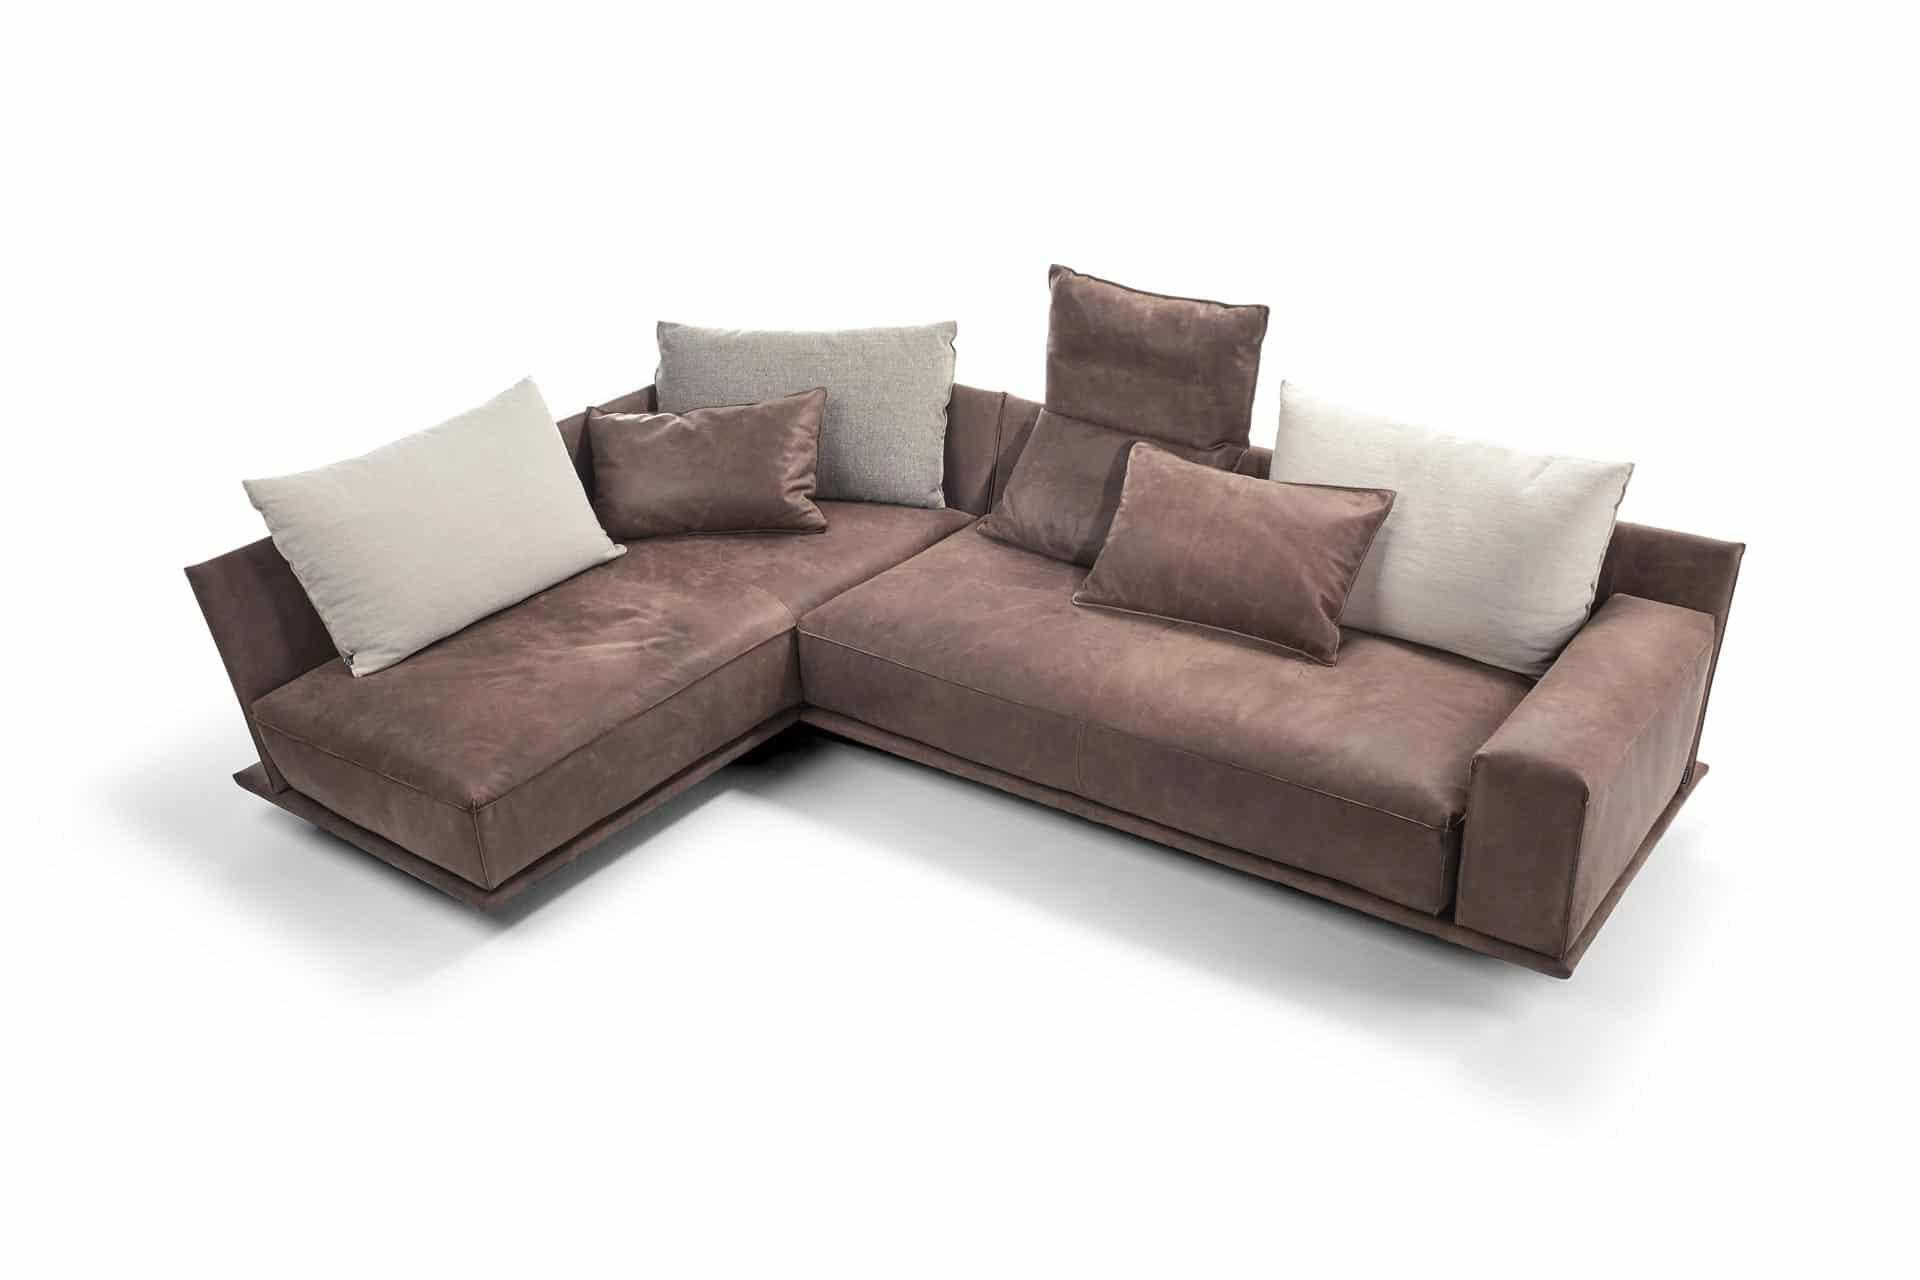 Full Size of Bullfrog Lulu Sofa Preis Couchzone Wohnzimmer Bullfrog Lulu